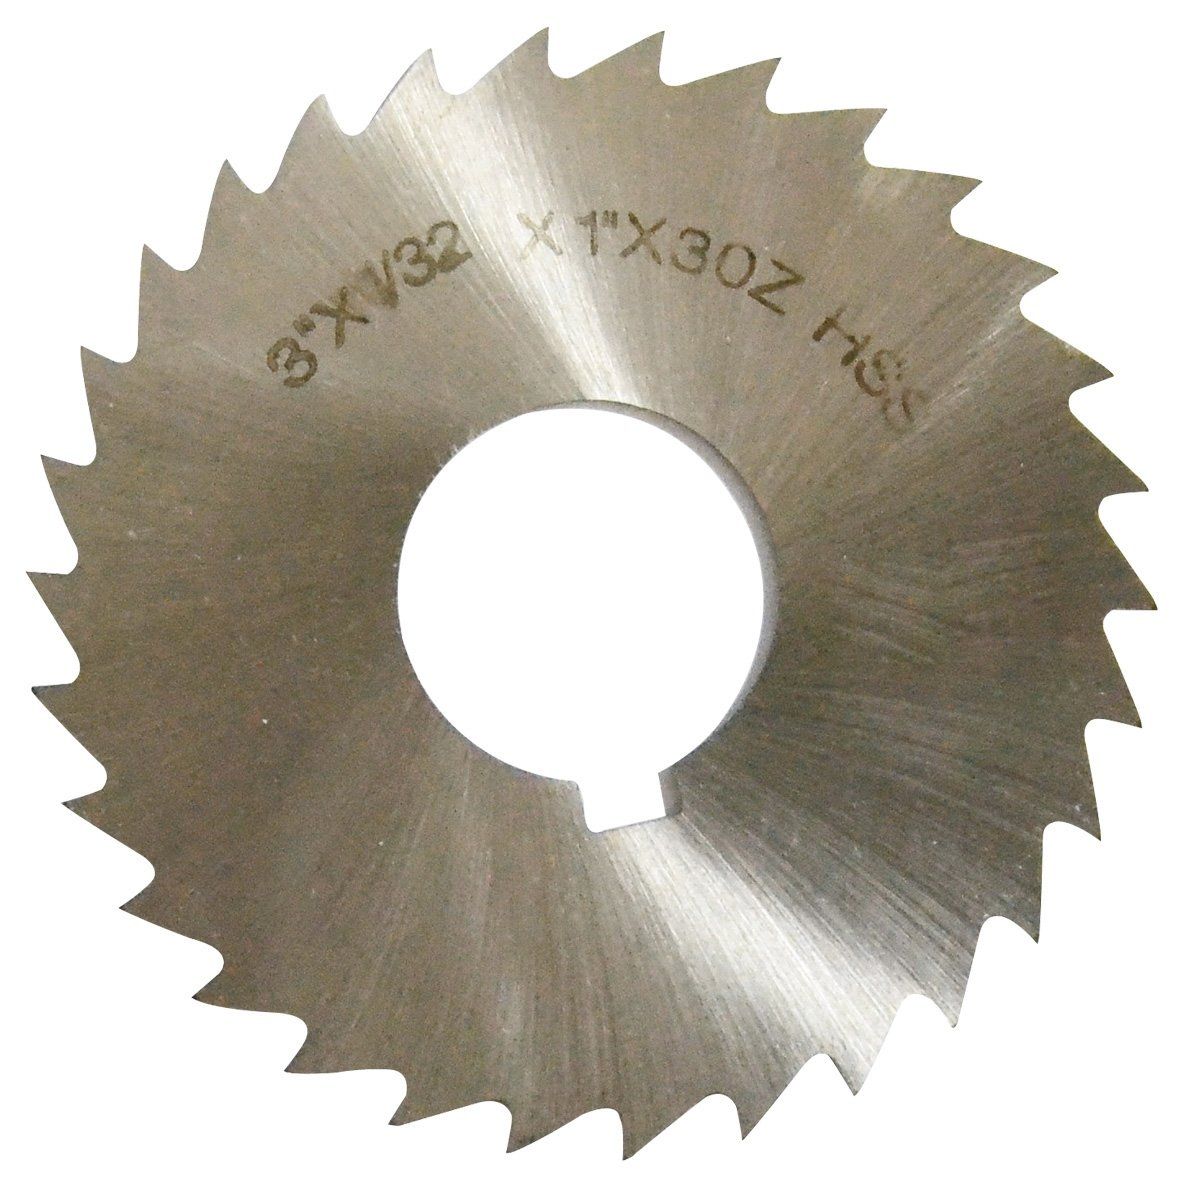 "HHIP 5071-4202 3 x 1/32 x 1"" High Speed Steel Plain Slitting Saw"